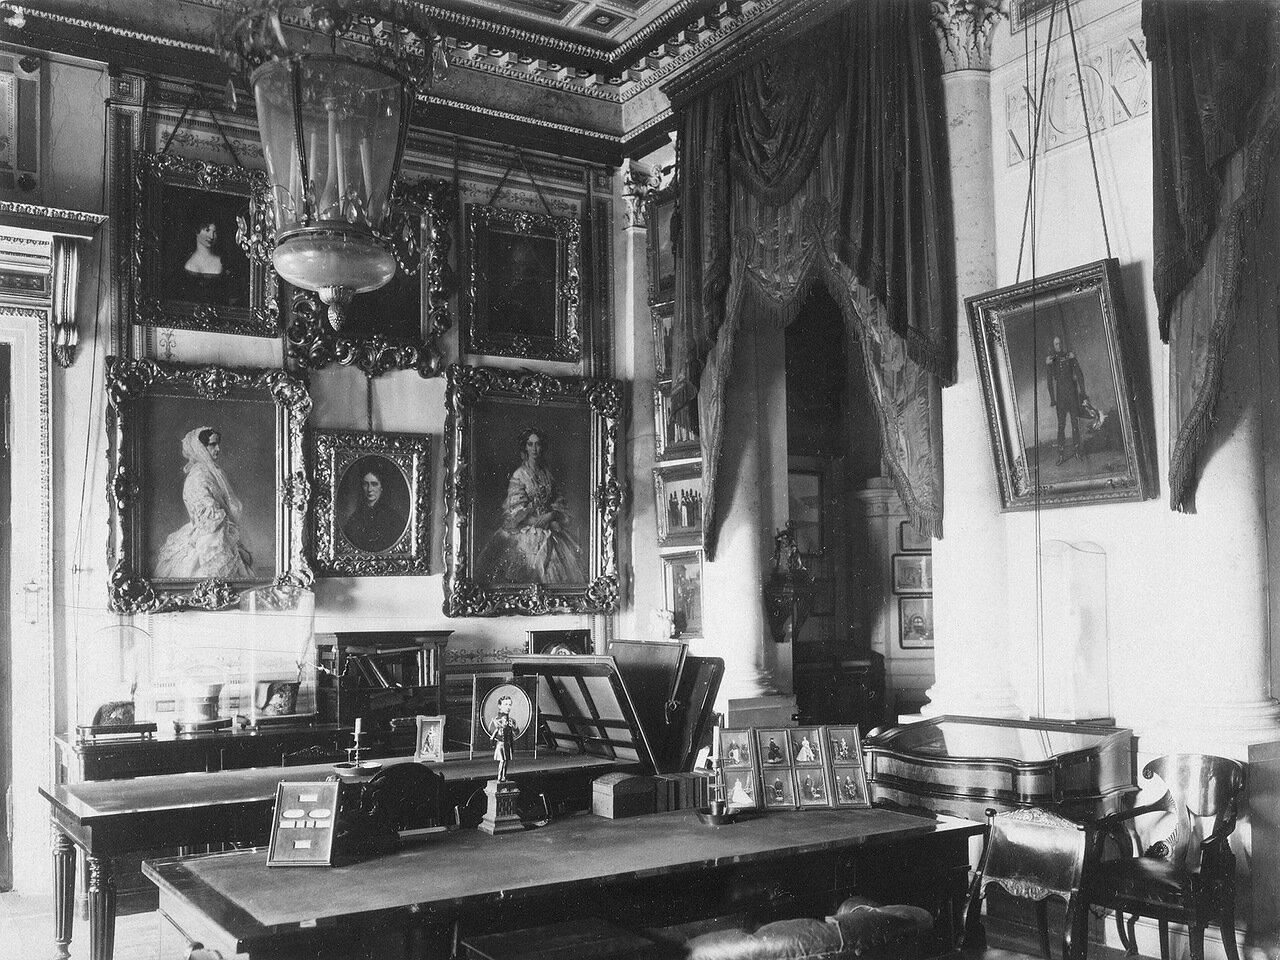 Кабинет императора Александра II в Зимнем дворце